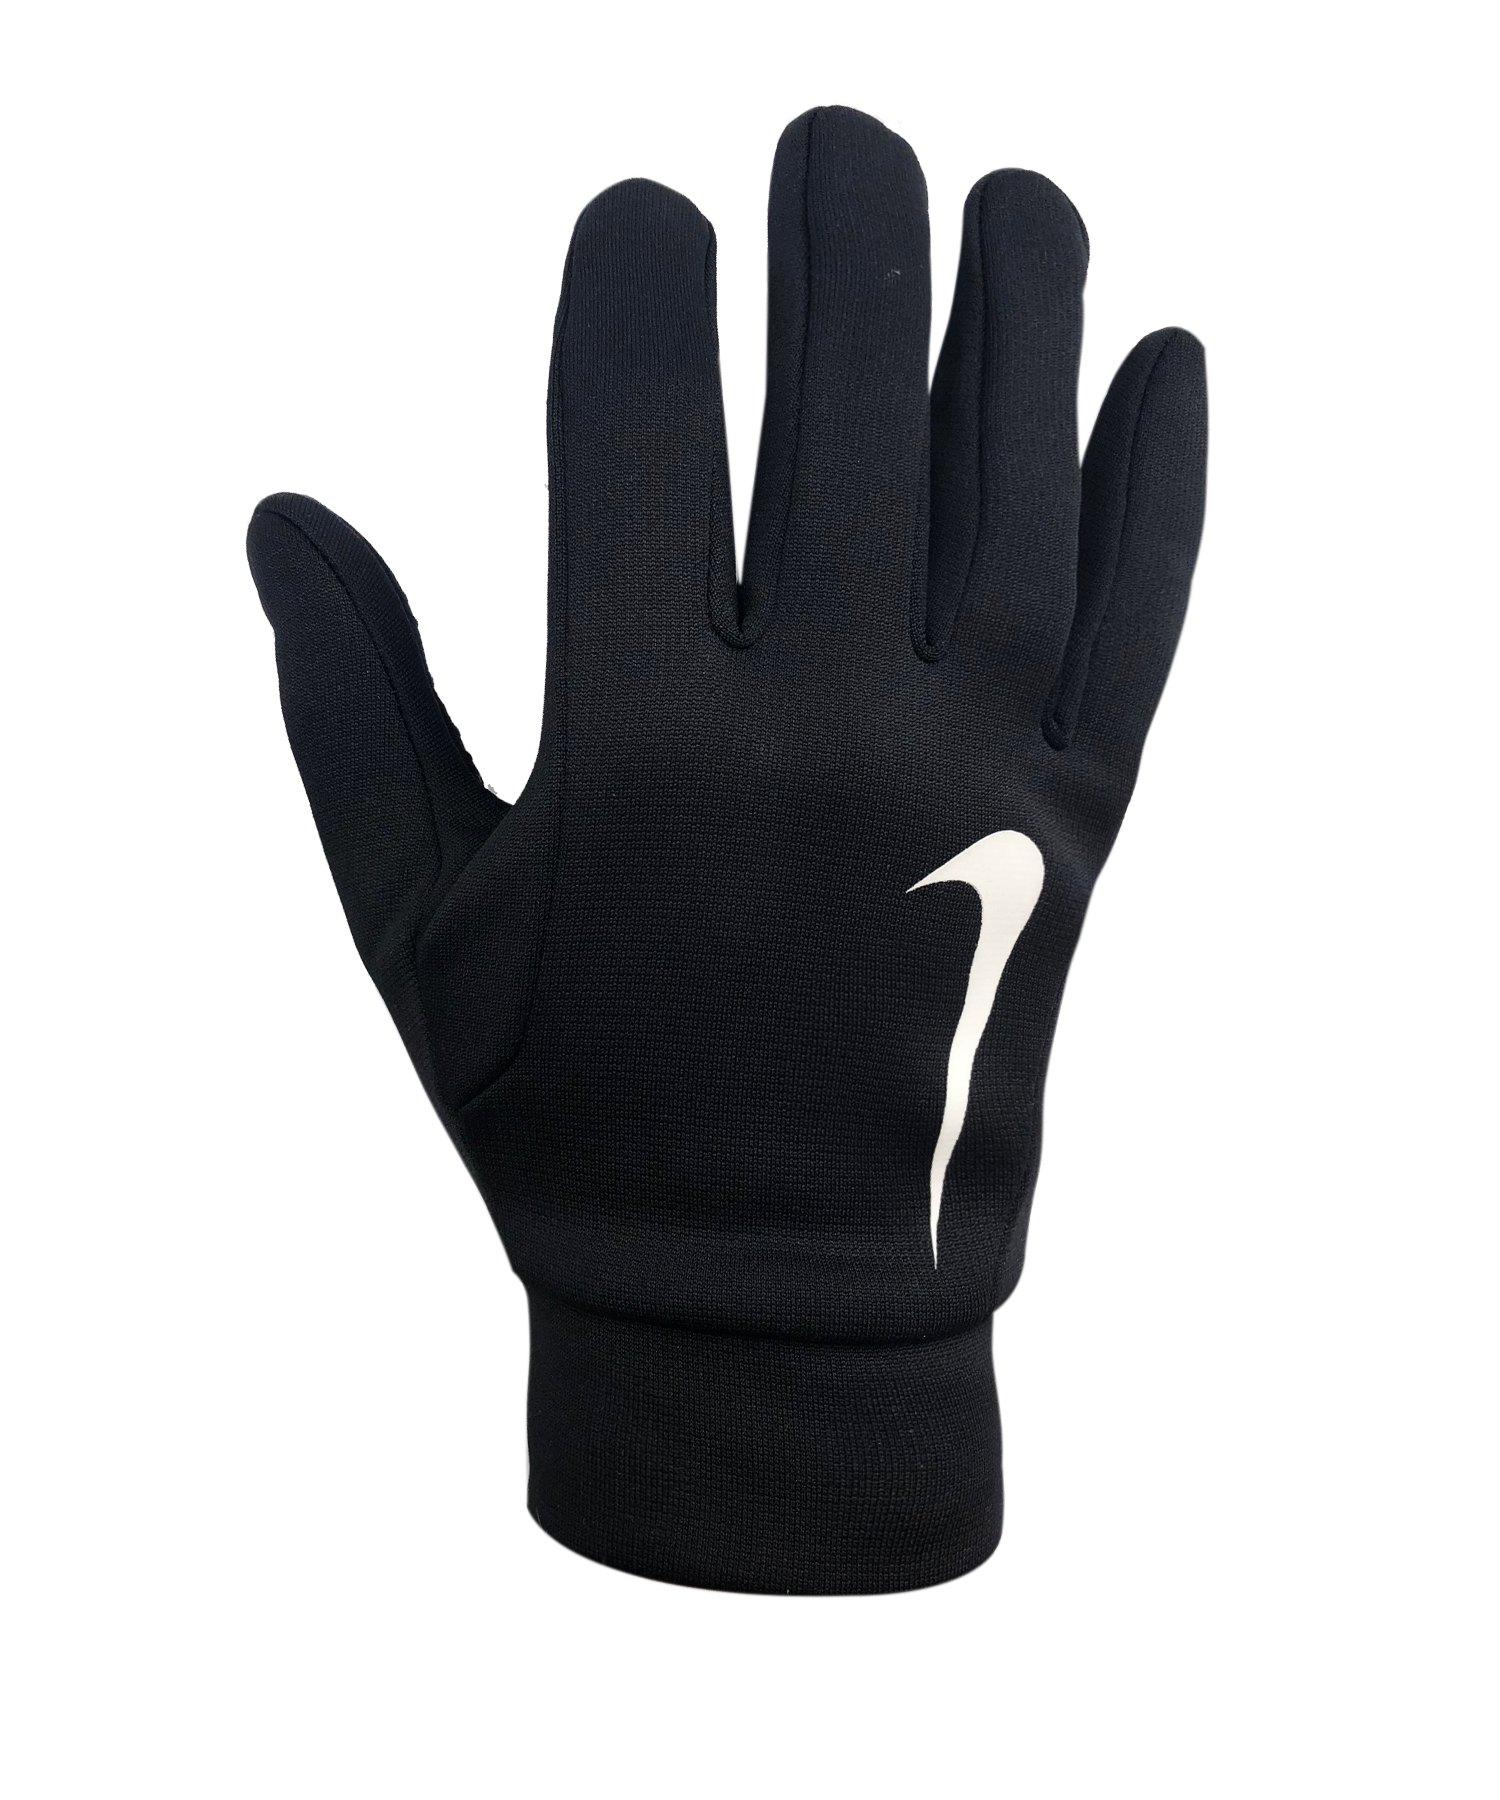 Nike Hyperwarm Promo Feldspielerhandschuhe F001 - schwarz